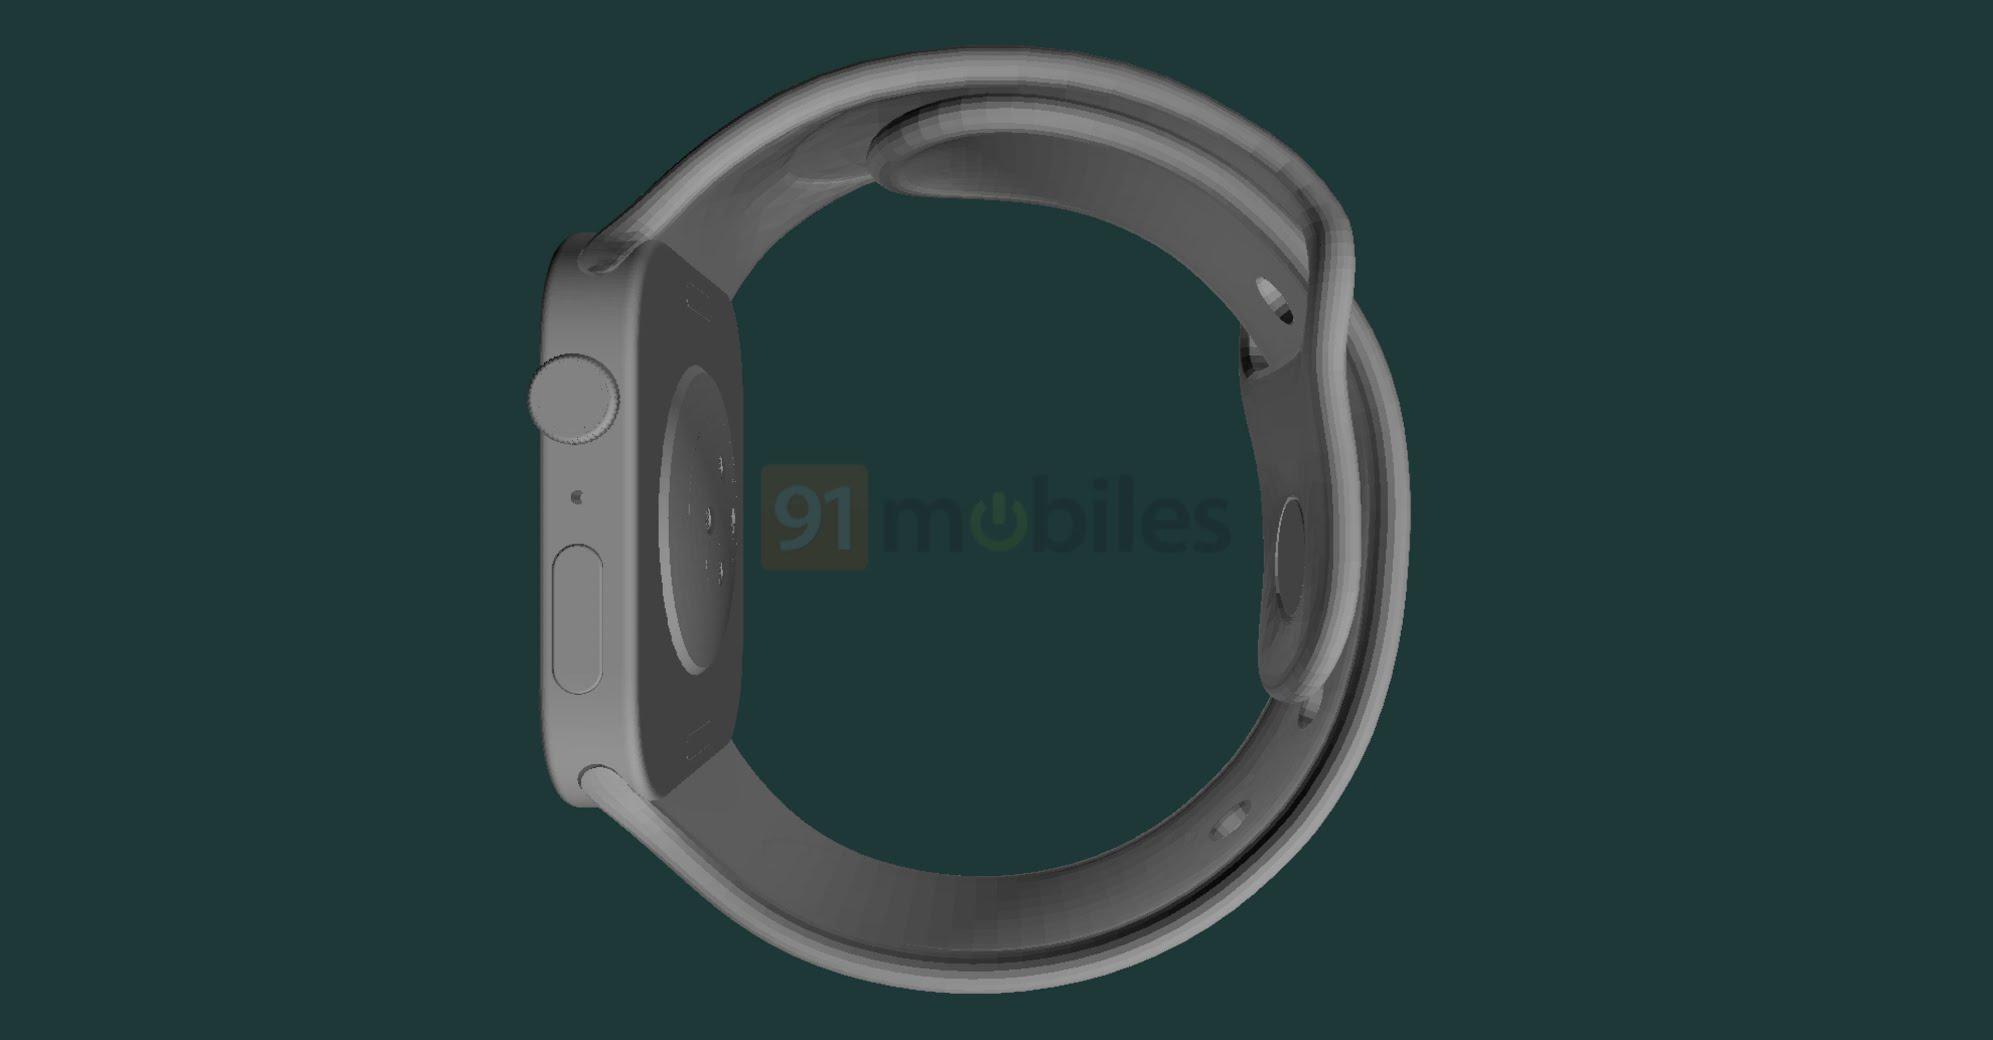 Apple Watch Series 7 Size